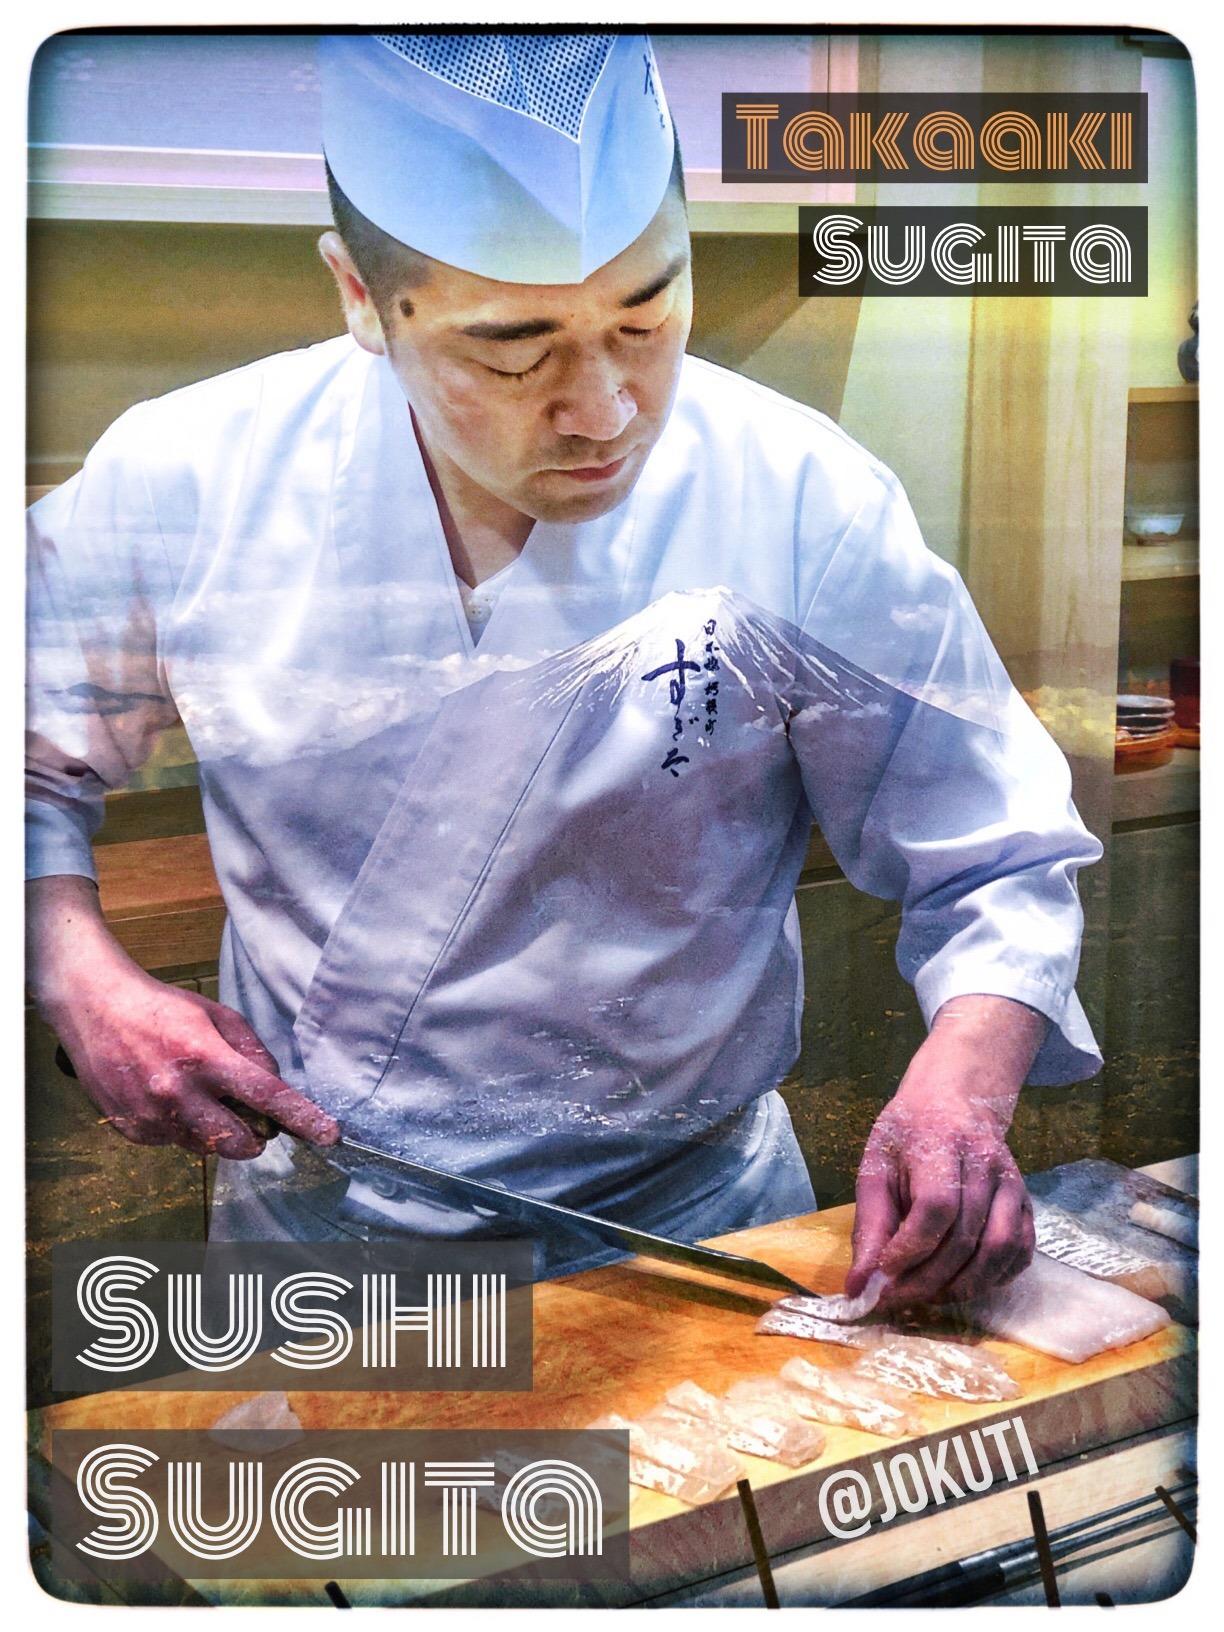 img_3775_sugita_sushi_michelin_tokyo_japan_vilagevo_jokuti.JPG